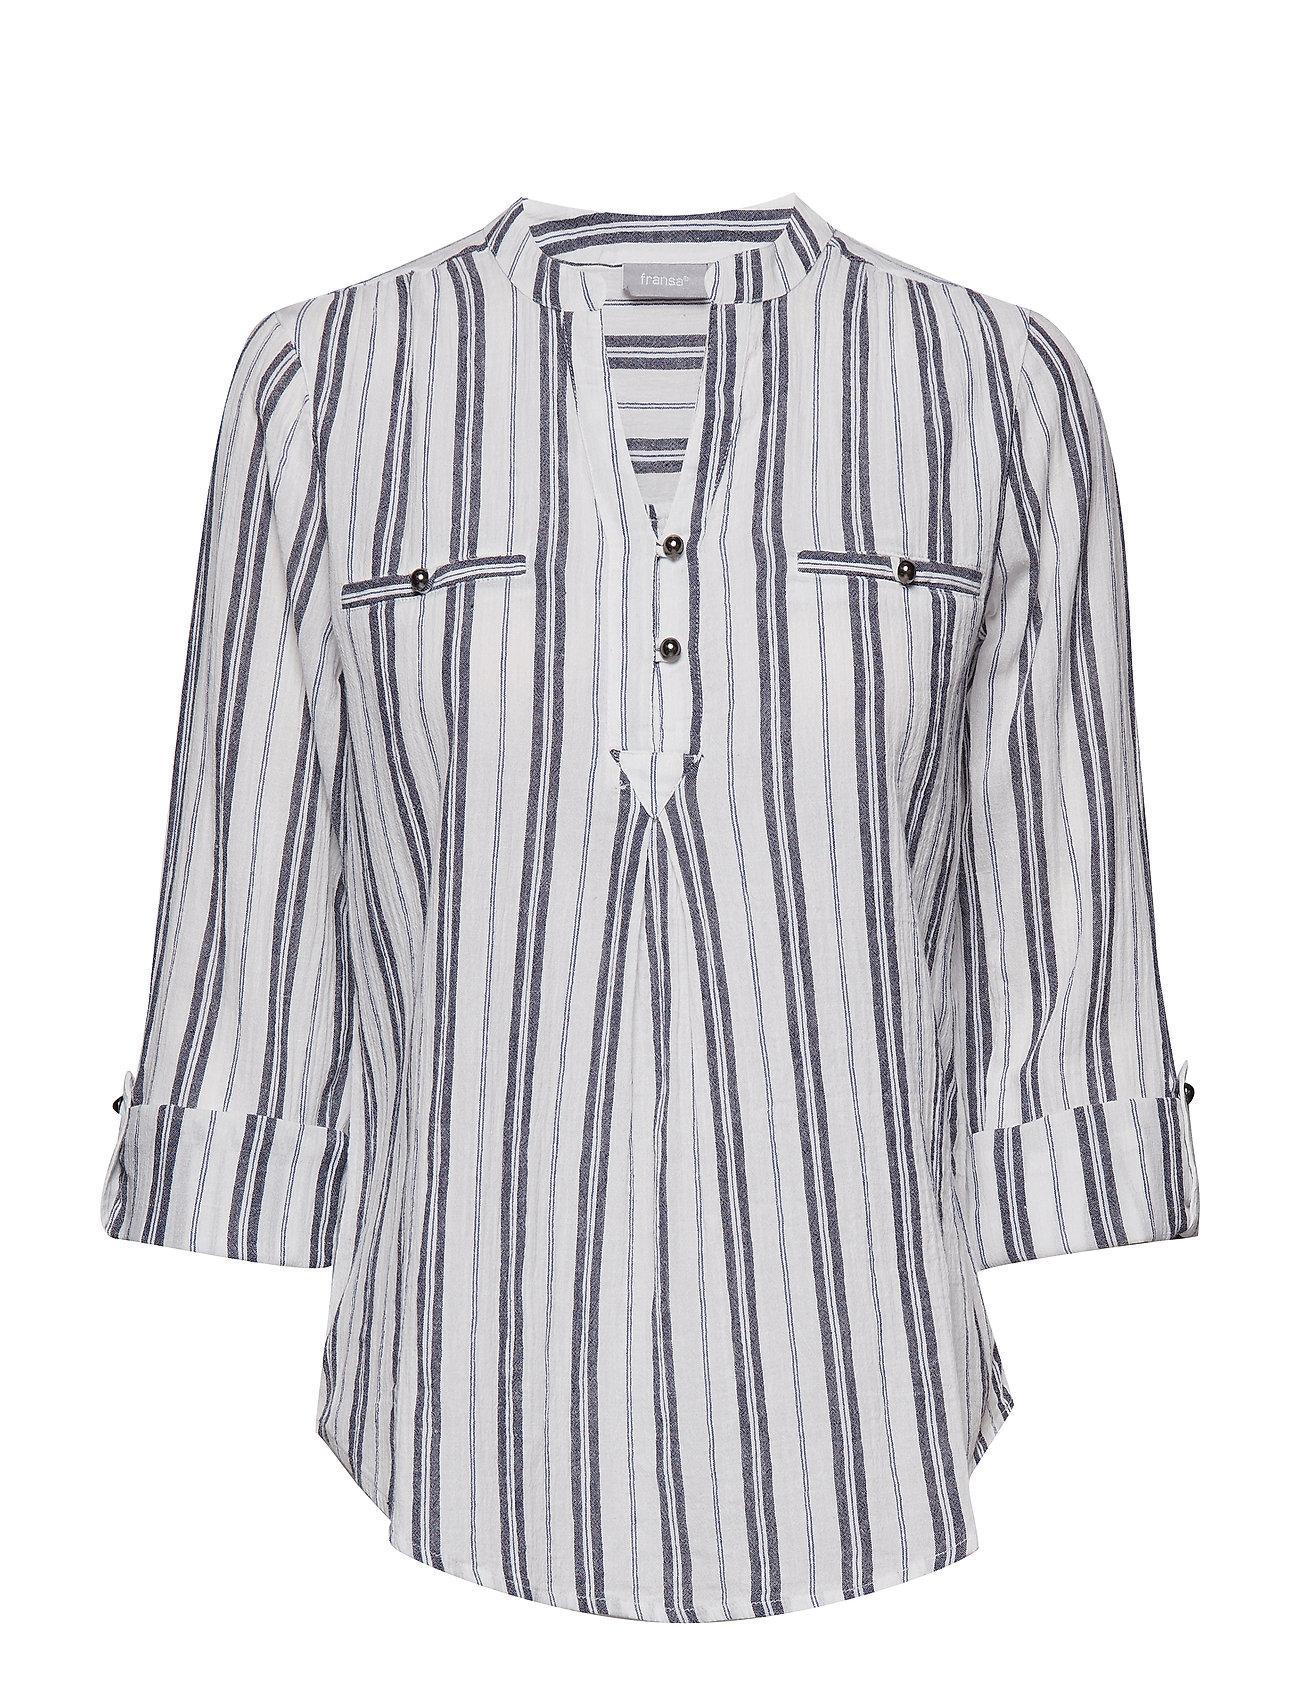 f2e84e7e ANTIQUE MIX Fransa Bastripe 1 Blouse kortærmede skjorter for dame ...